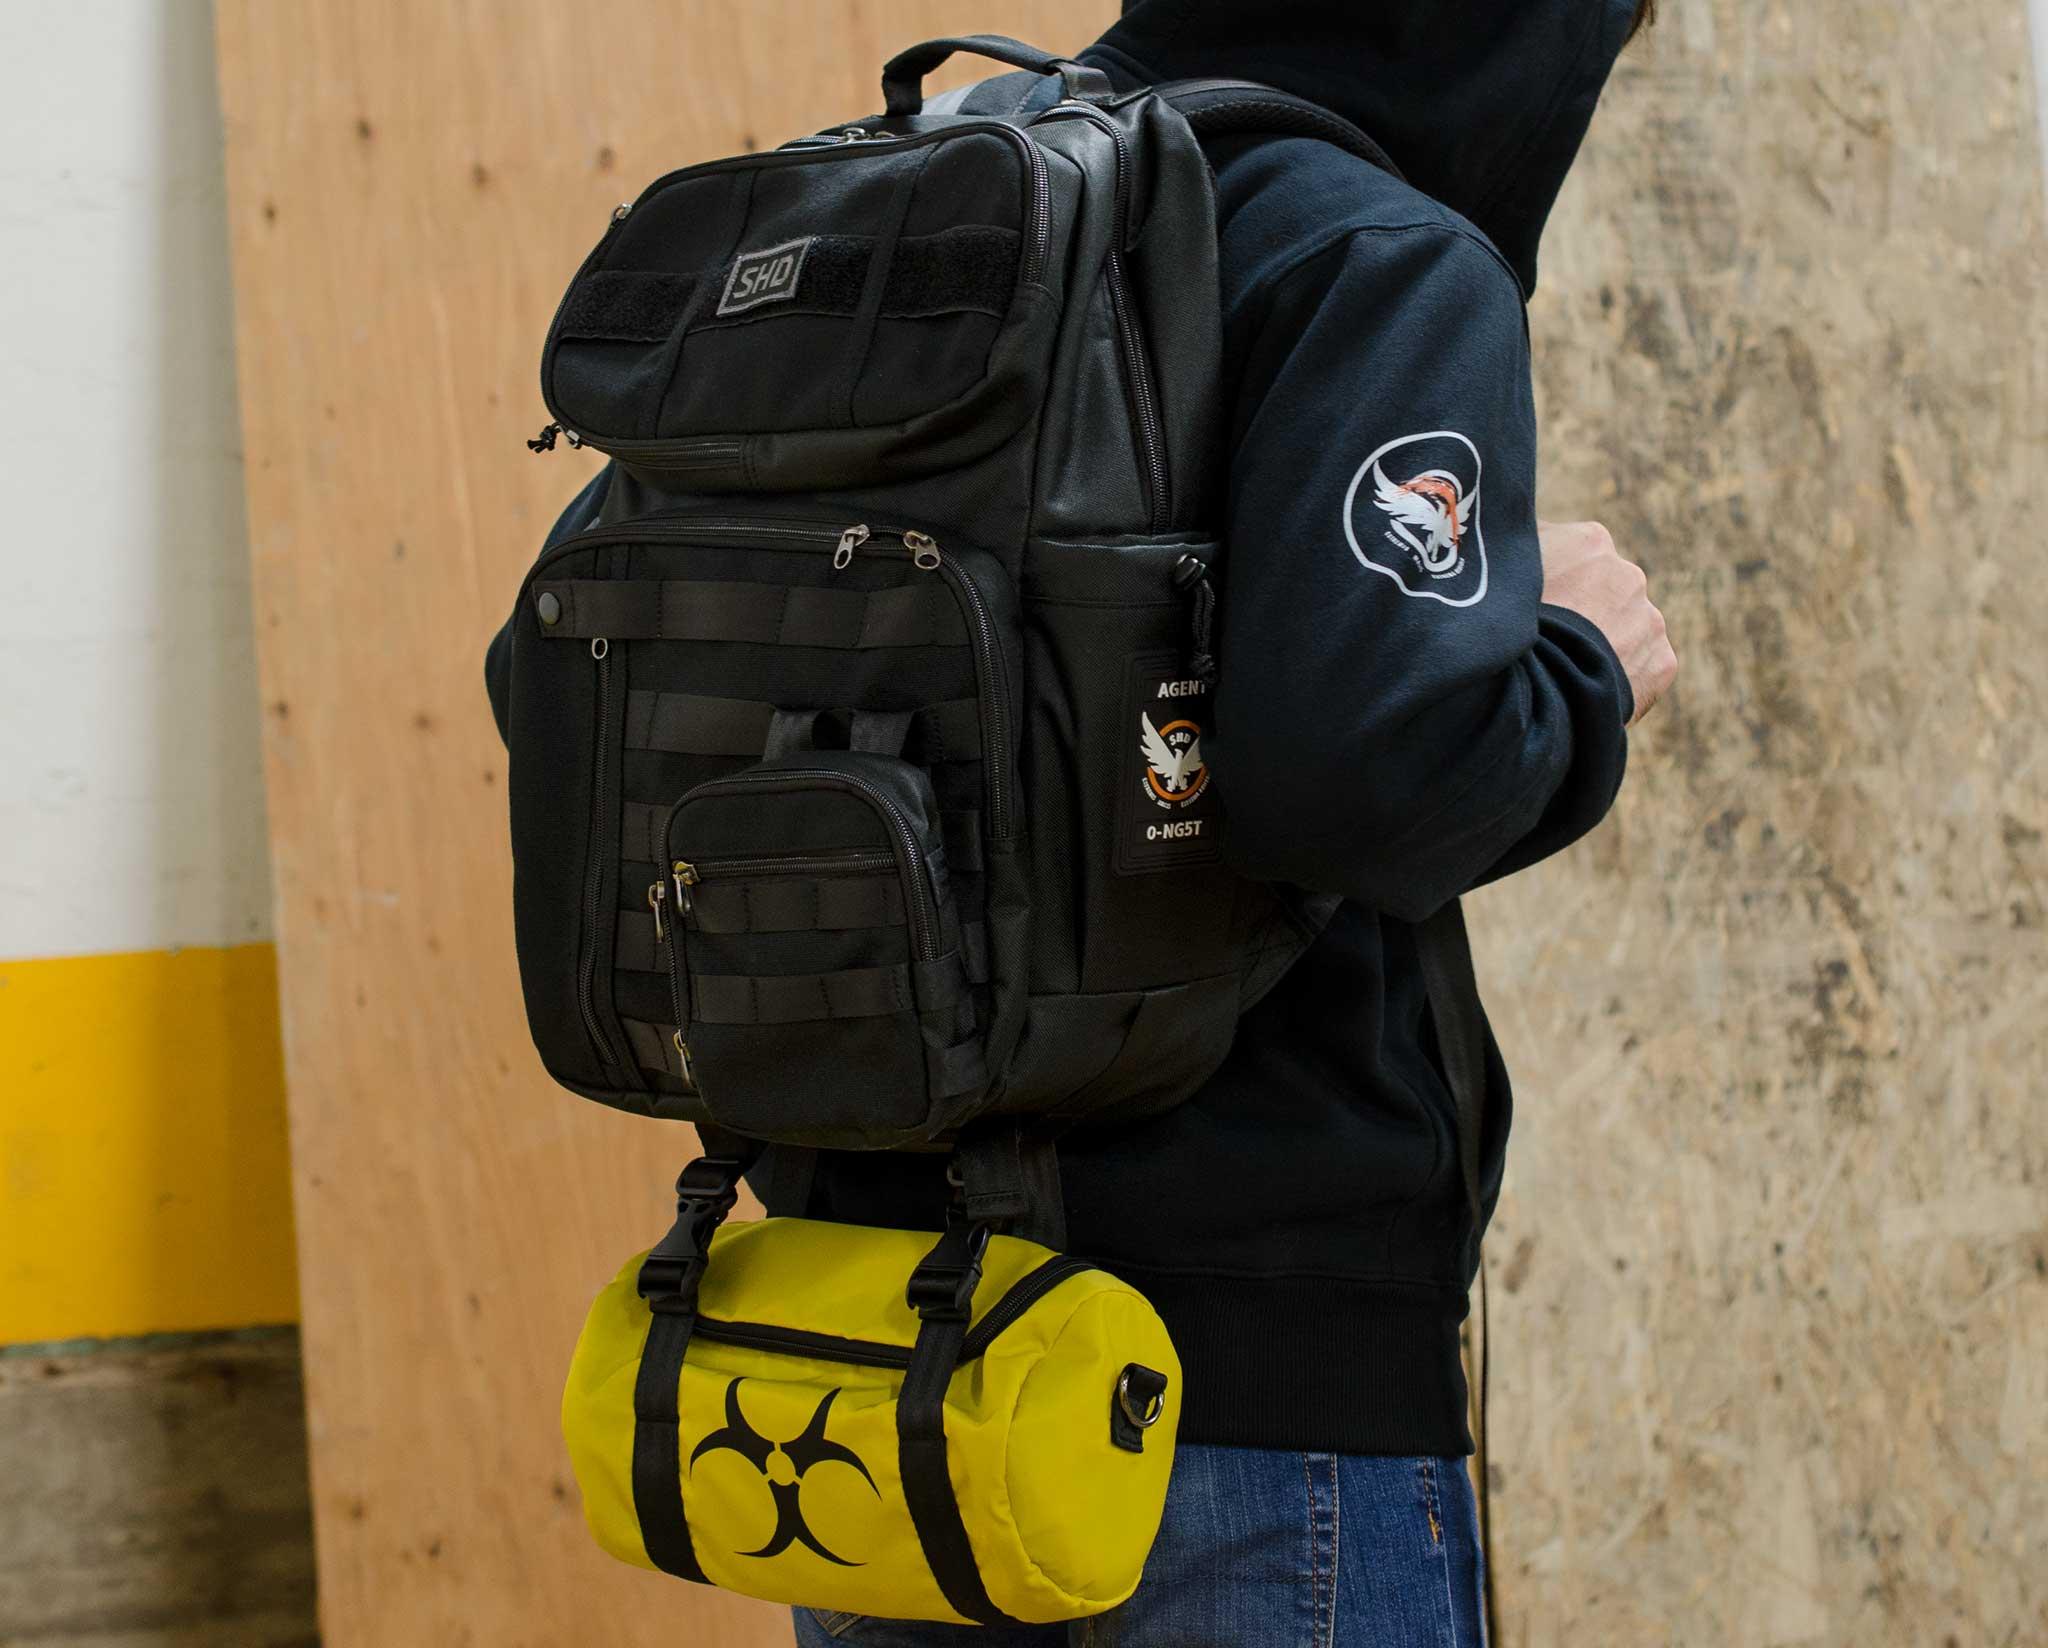 The Division 2 SHD Agent Backpack Bag //w LOGOS Black Official UBI